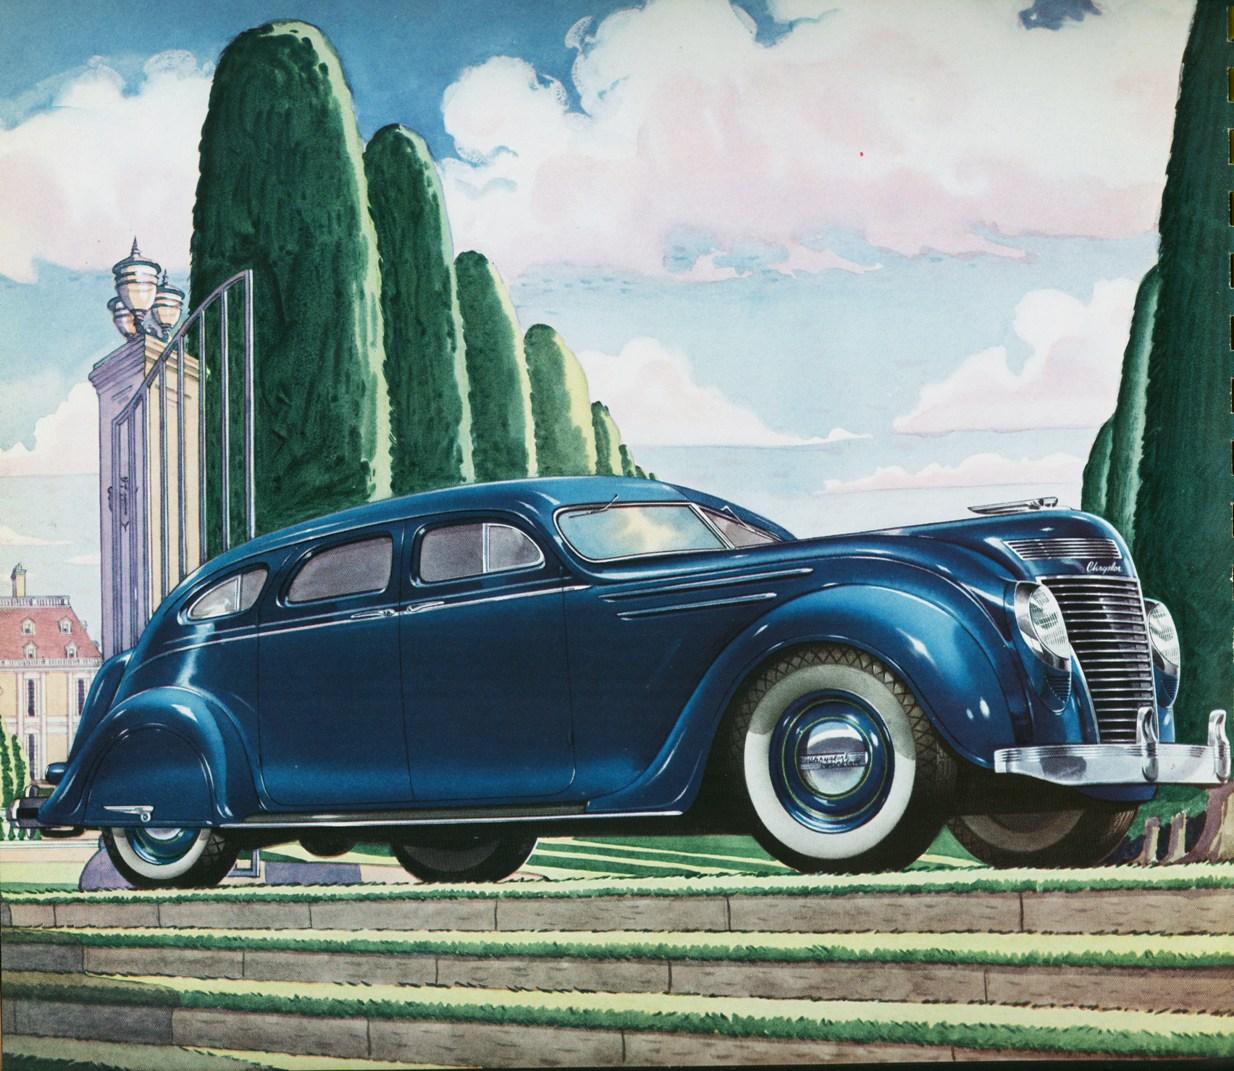 Chrysler airflow sedan